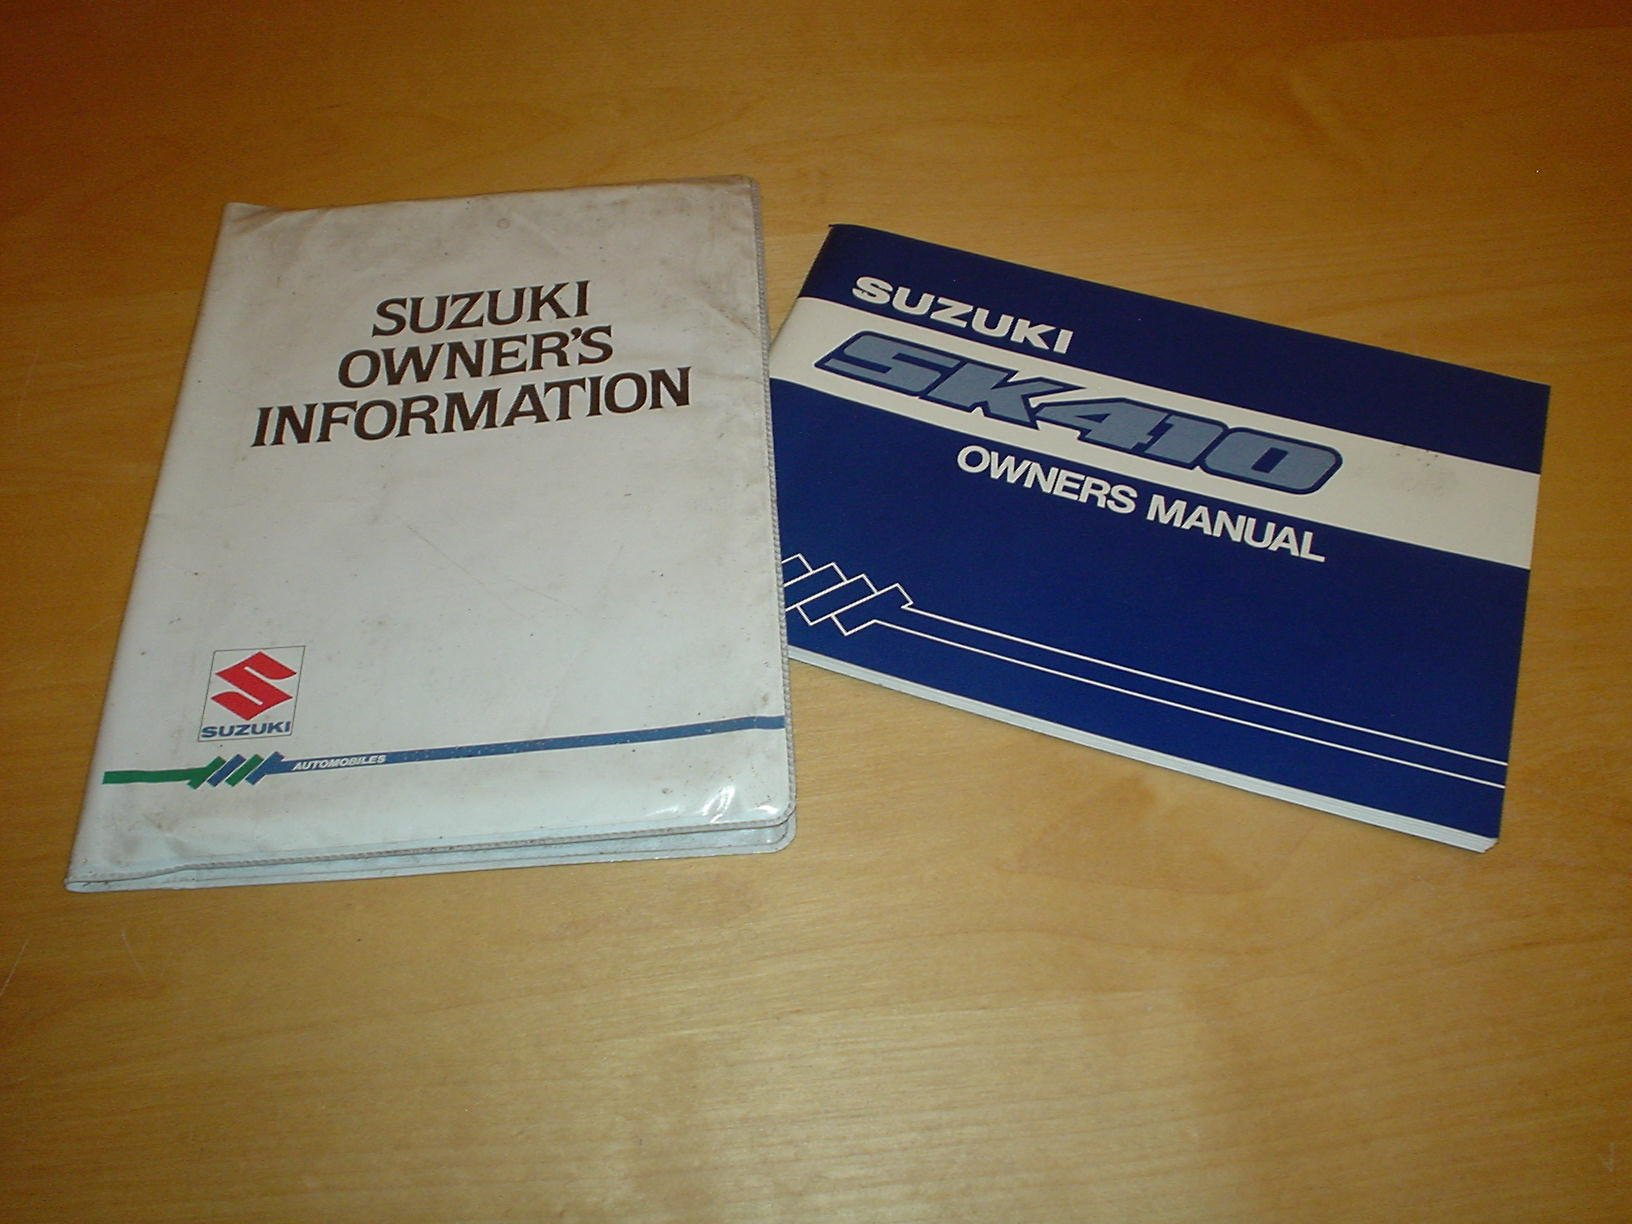 SUZUKI SK410 SUPER CARRY OWNERS MANUAL HANDBOOK (1985 - 1991) - SK 410  SUPER CARRY - HAND BOOK MANUAL: Amazon.co.uk: SUZUKI: Books